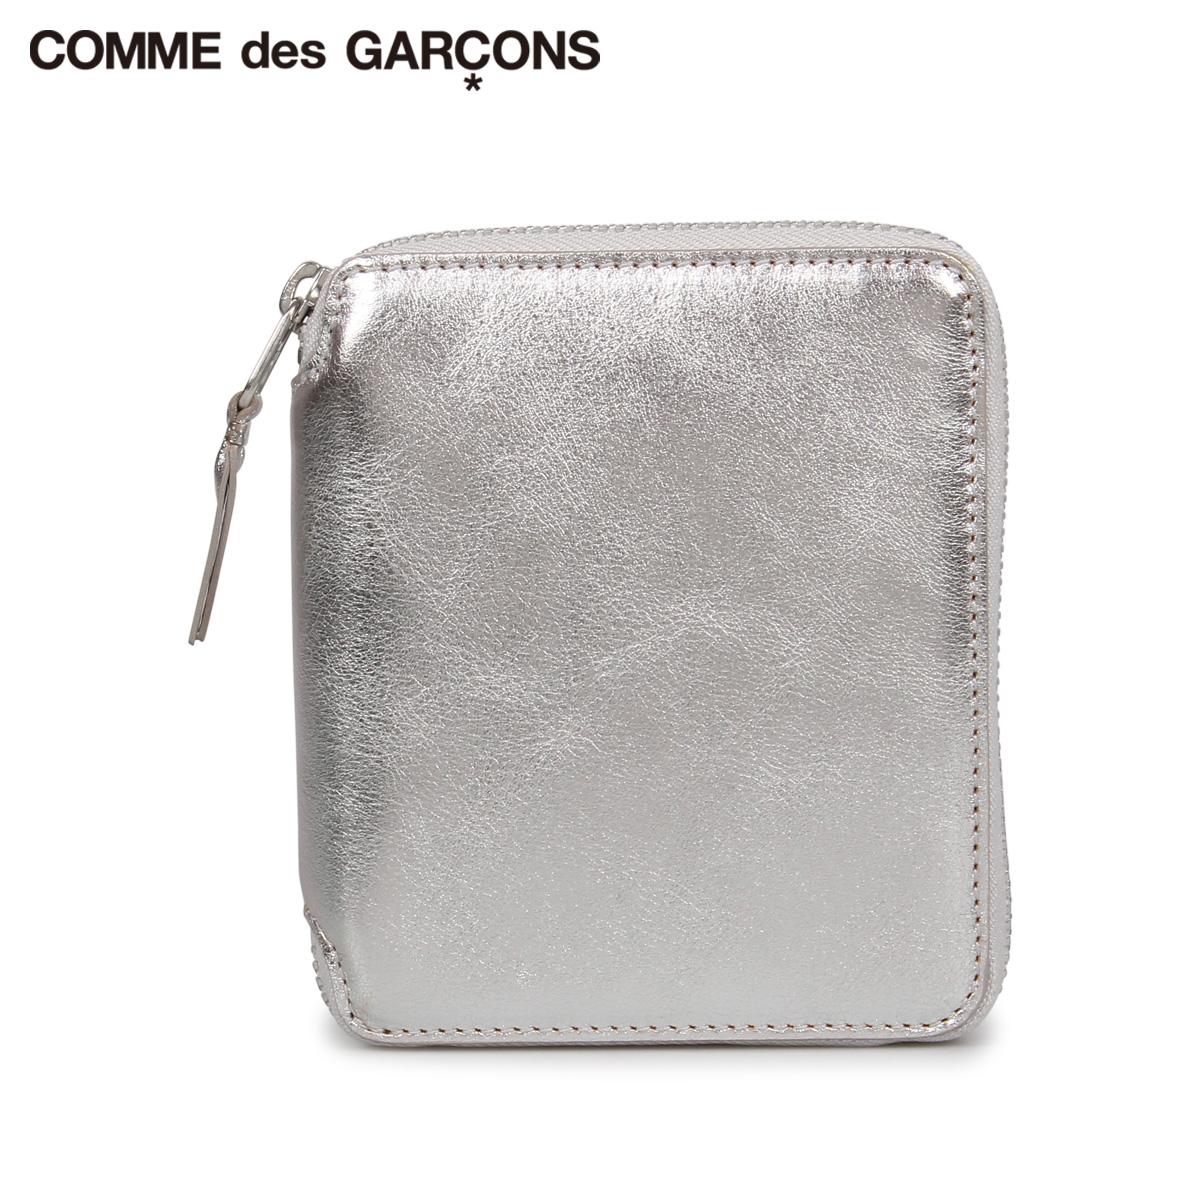 COMME des GARCONS GOLD AND SILVER WALLET コムデギャルソン 財布 二つ折り メンズ レディース ラウンドファスナー 本革 シルバー SA2100G